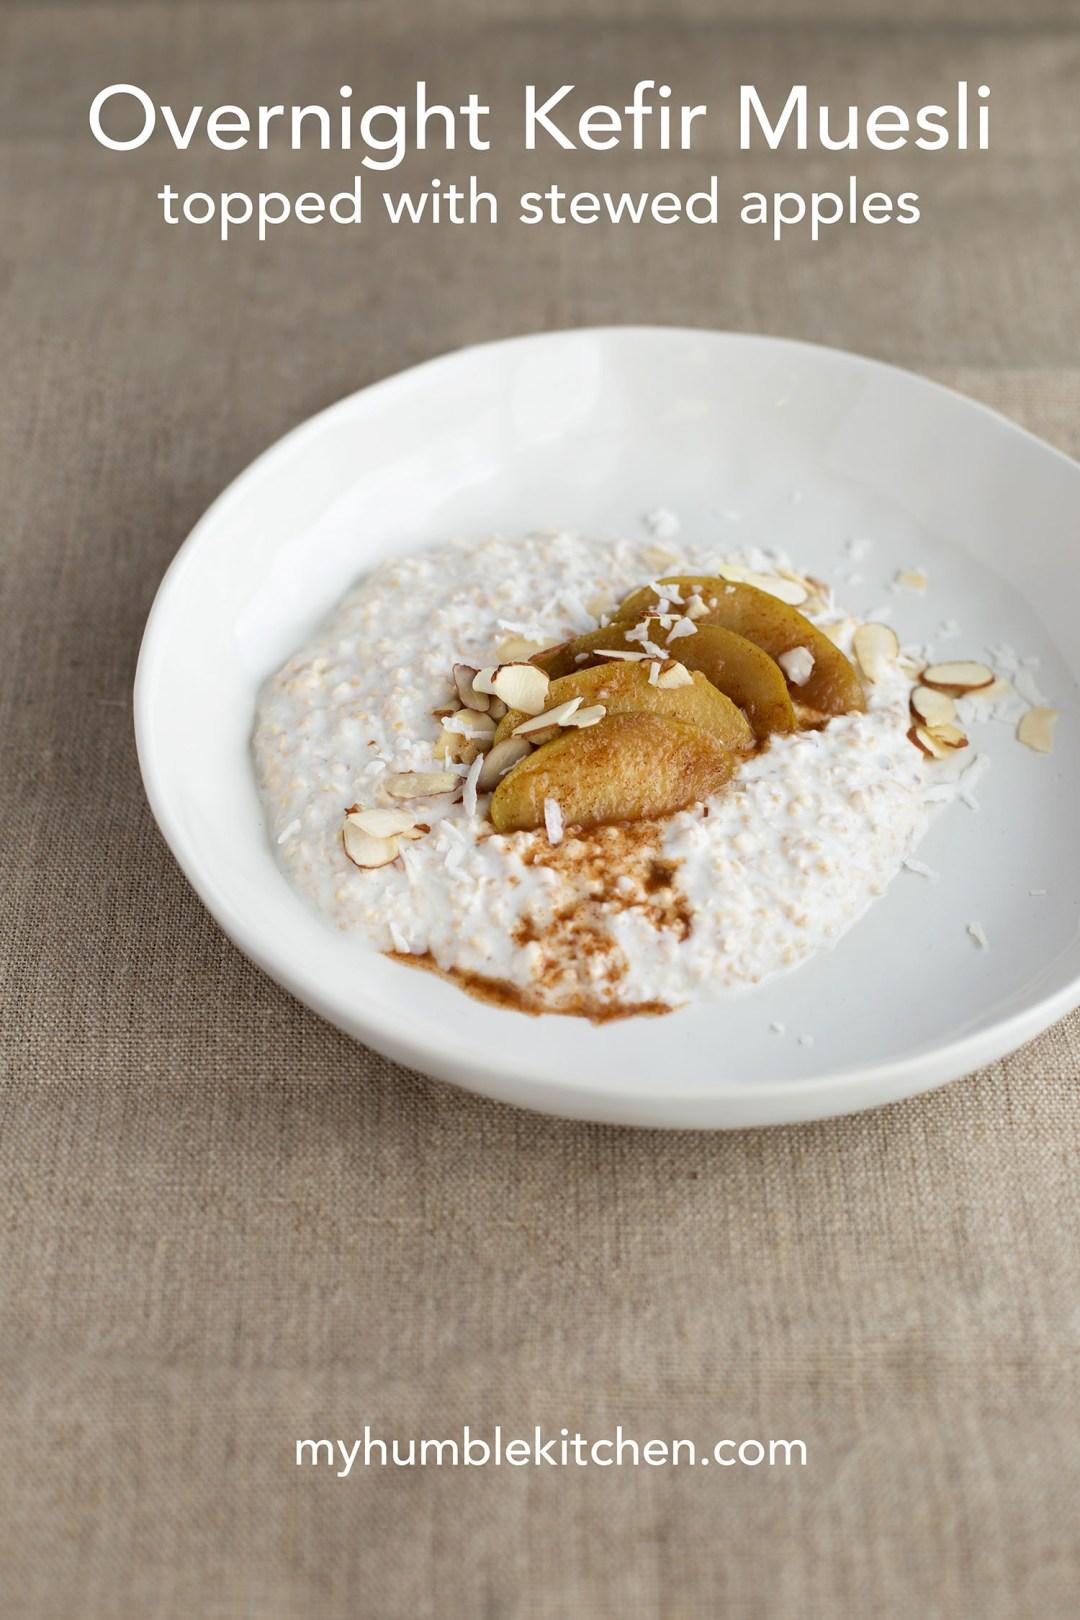 Overnight Kefir Muesli Topped with Stewed Apples | myhumblekitchen.com